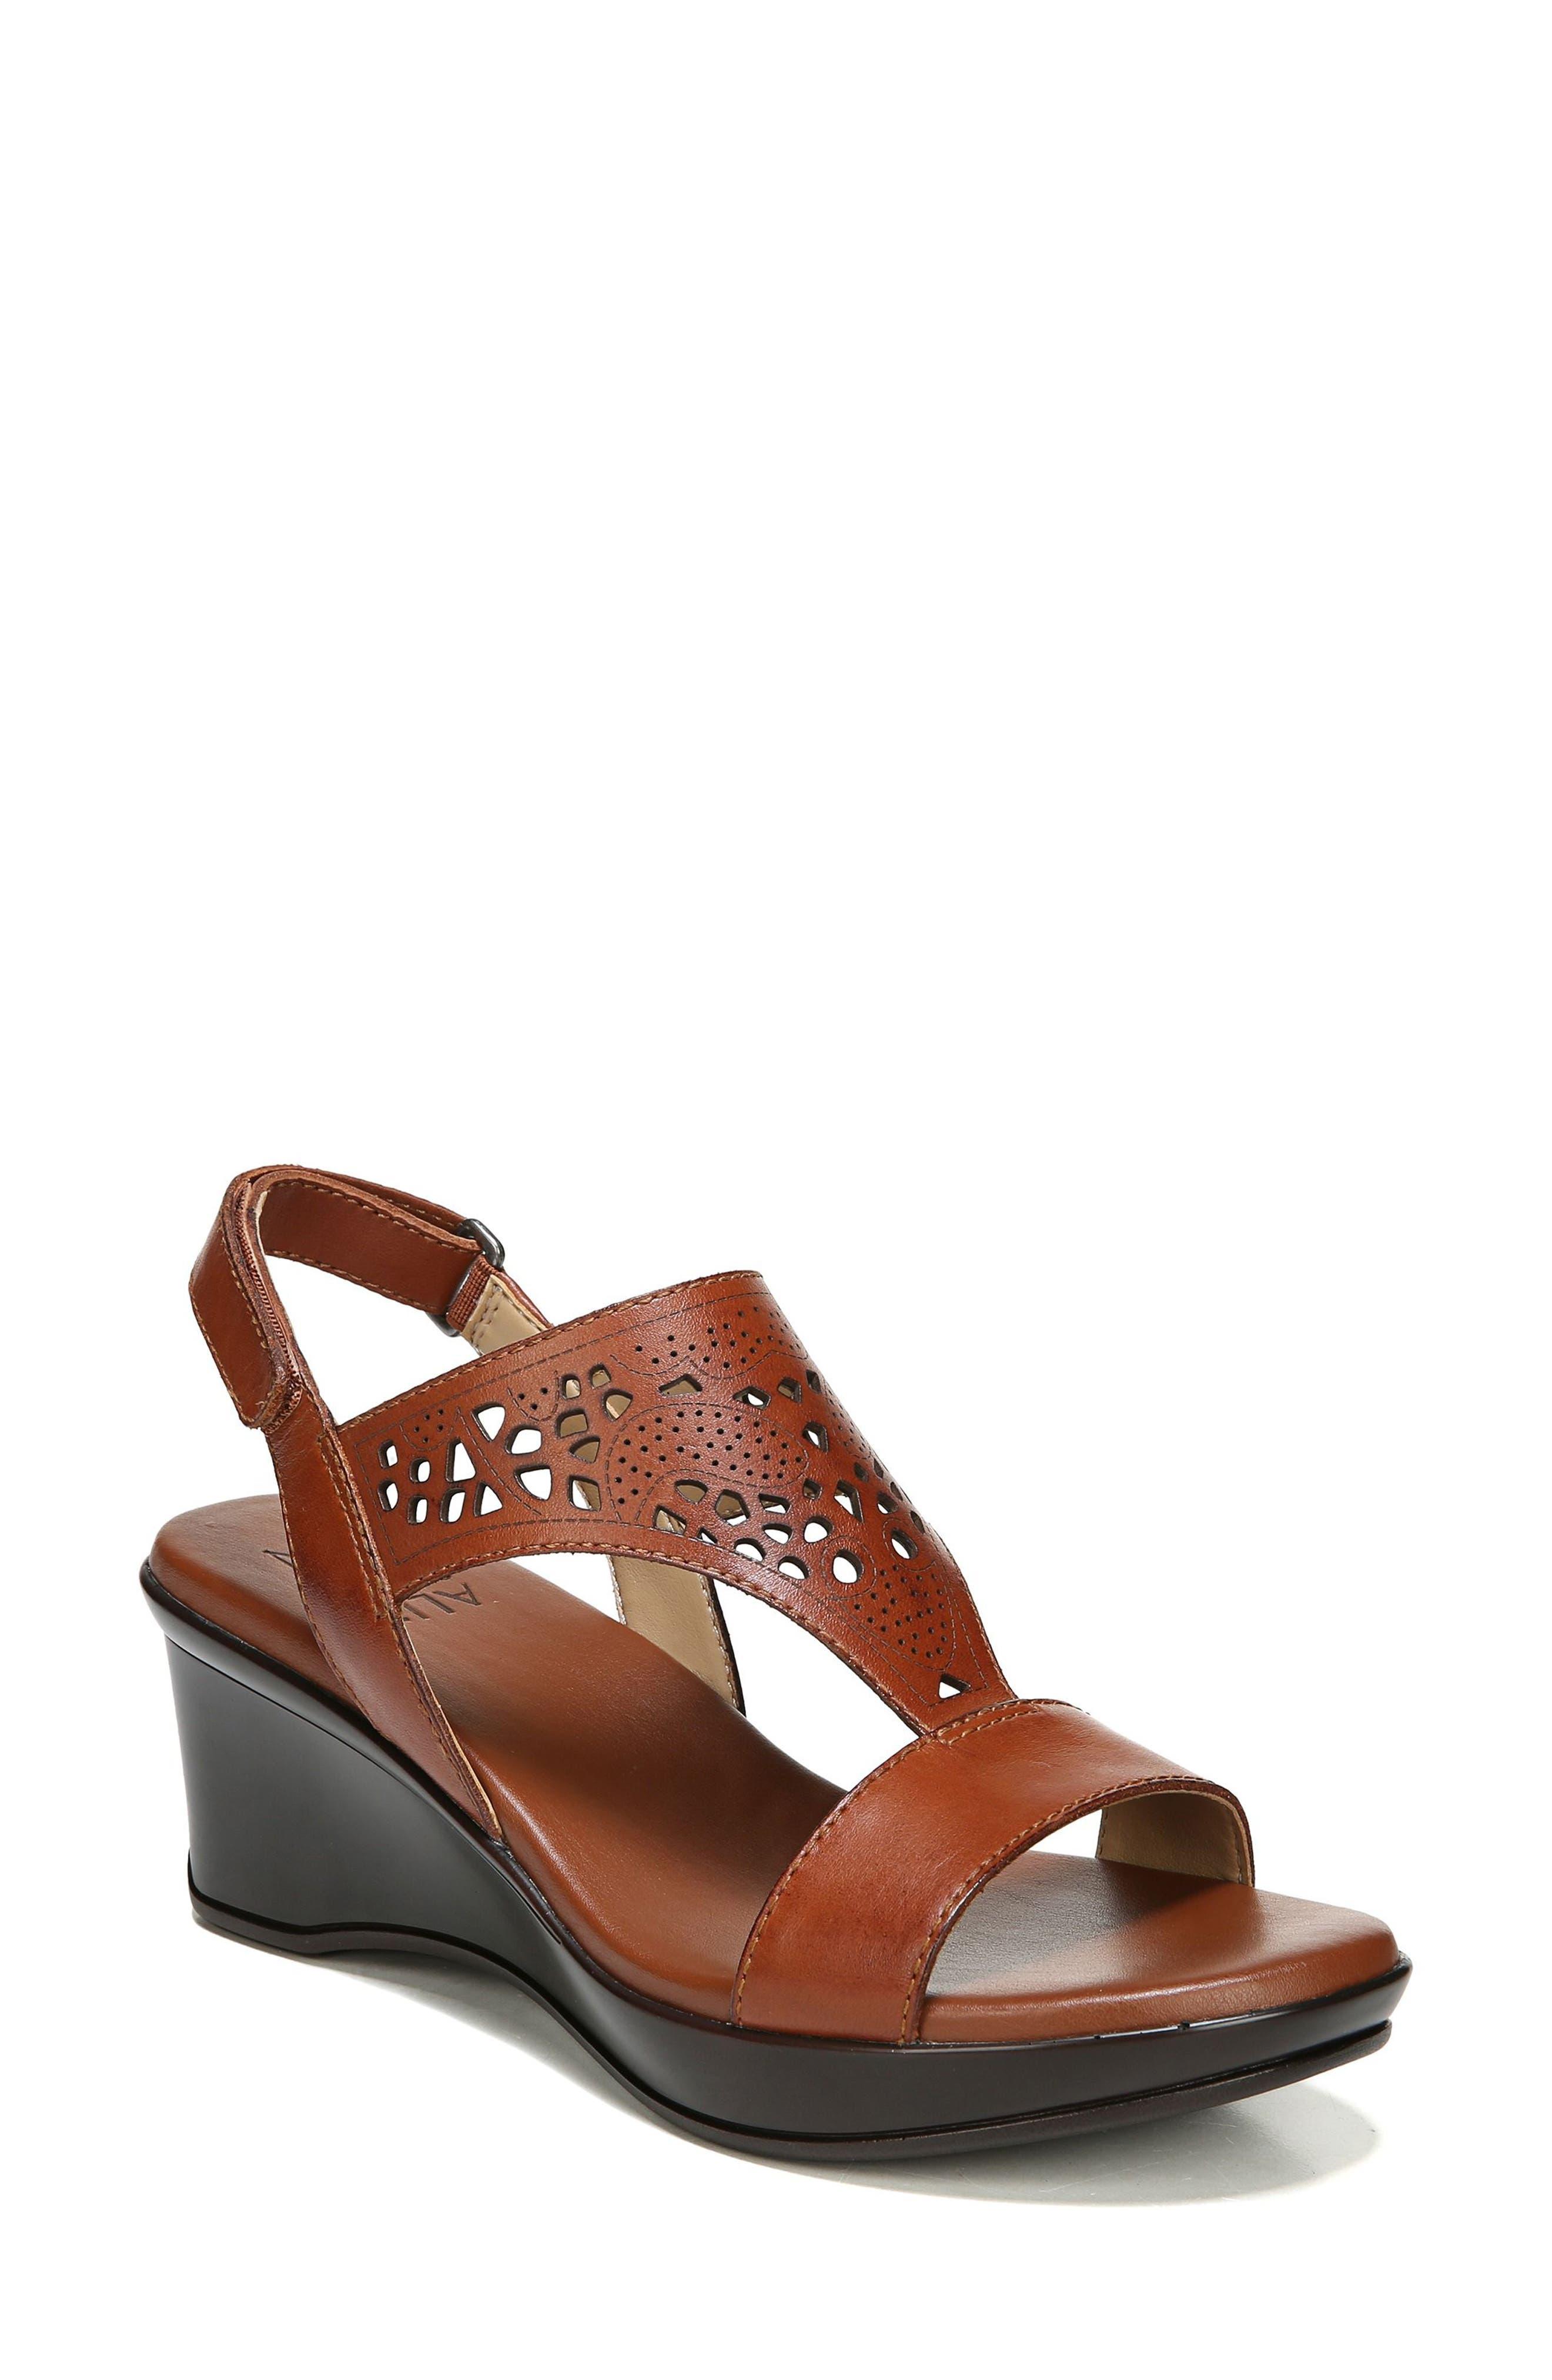 Veda Wedge Sandal,                         Main,                         color, Cognac Leater